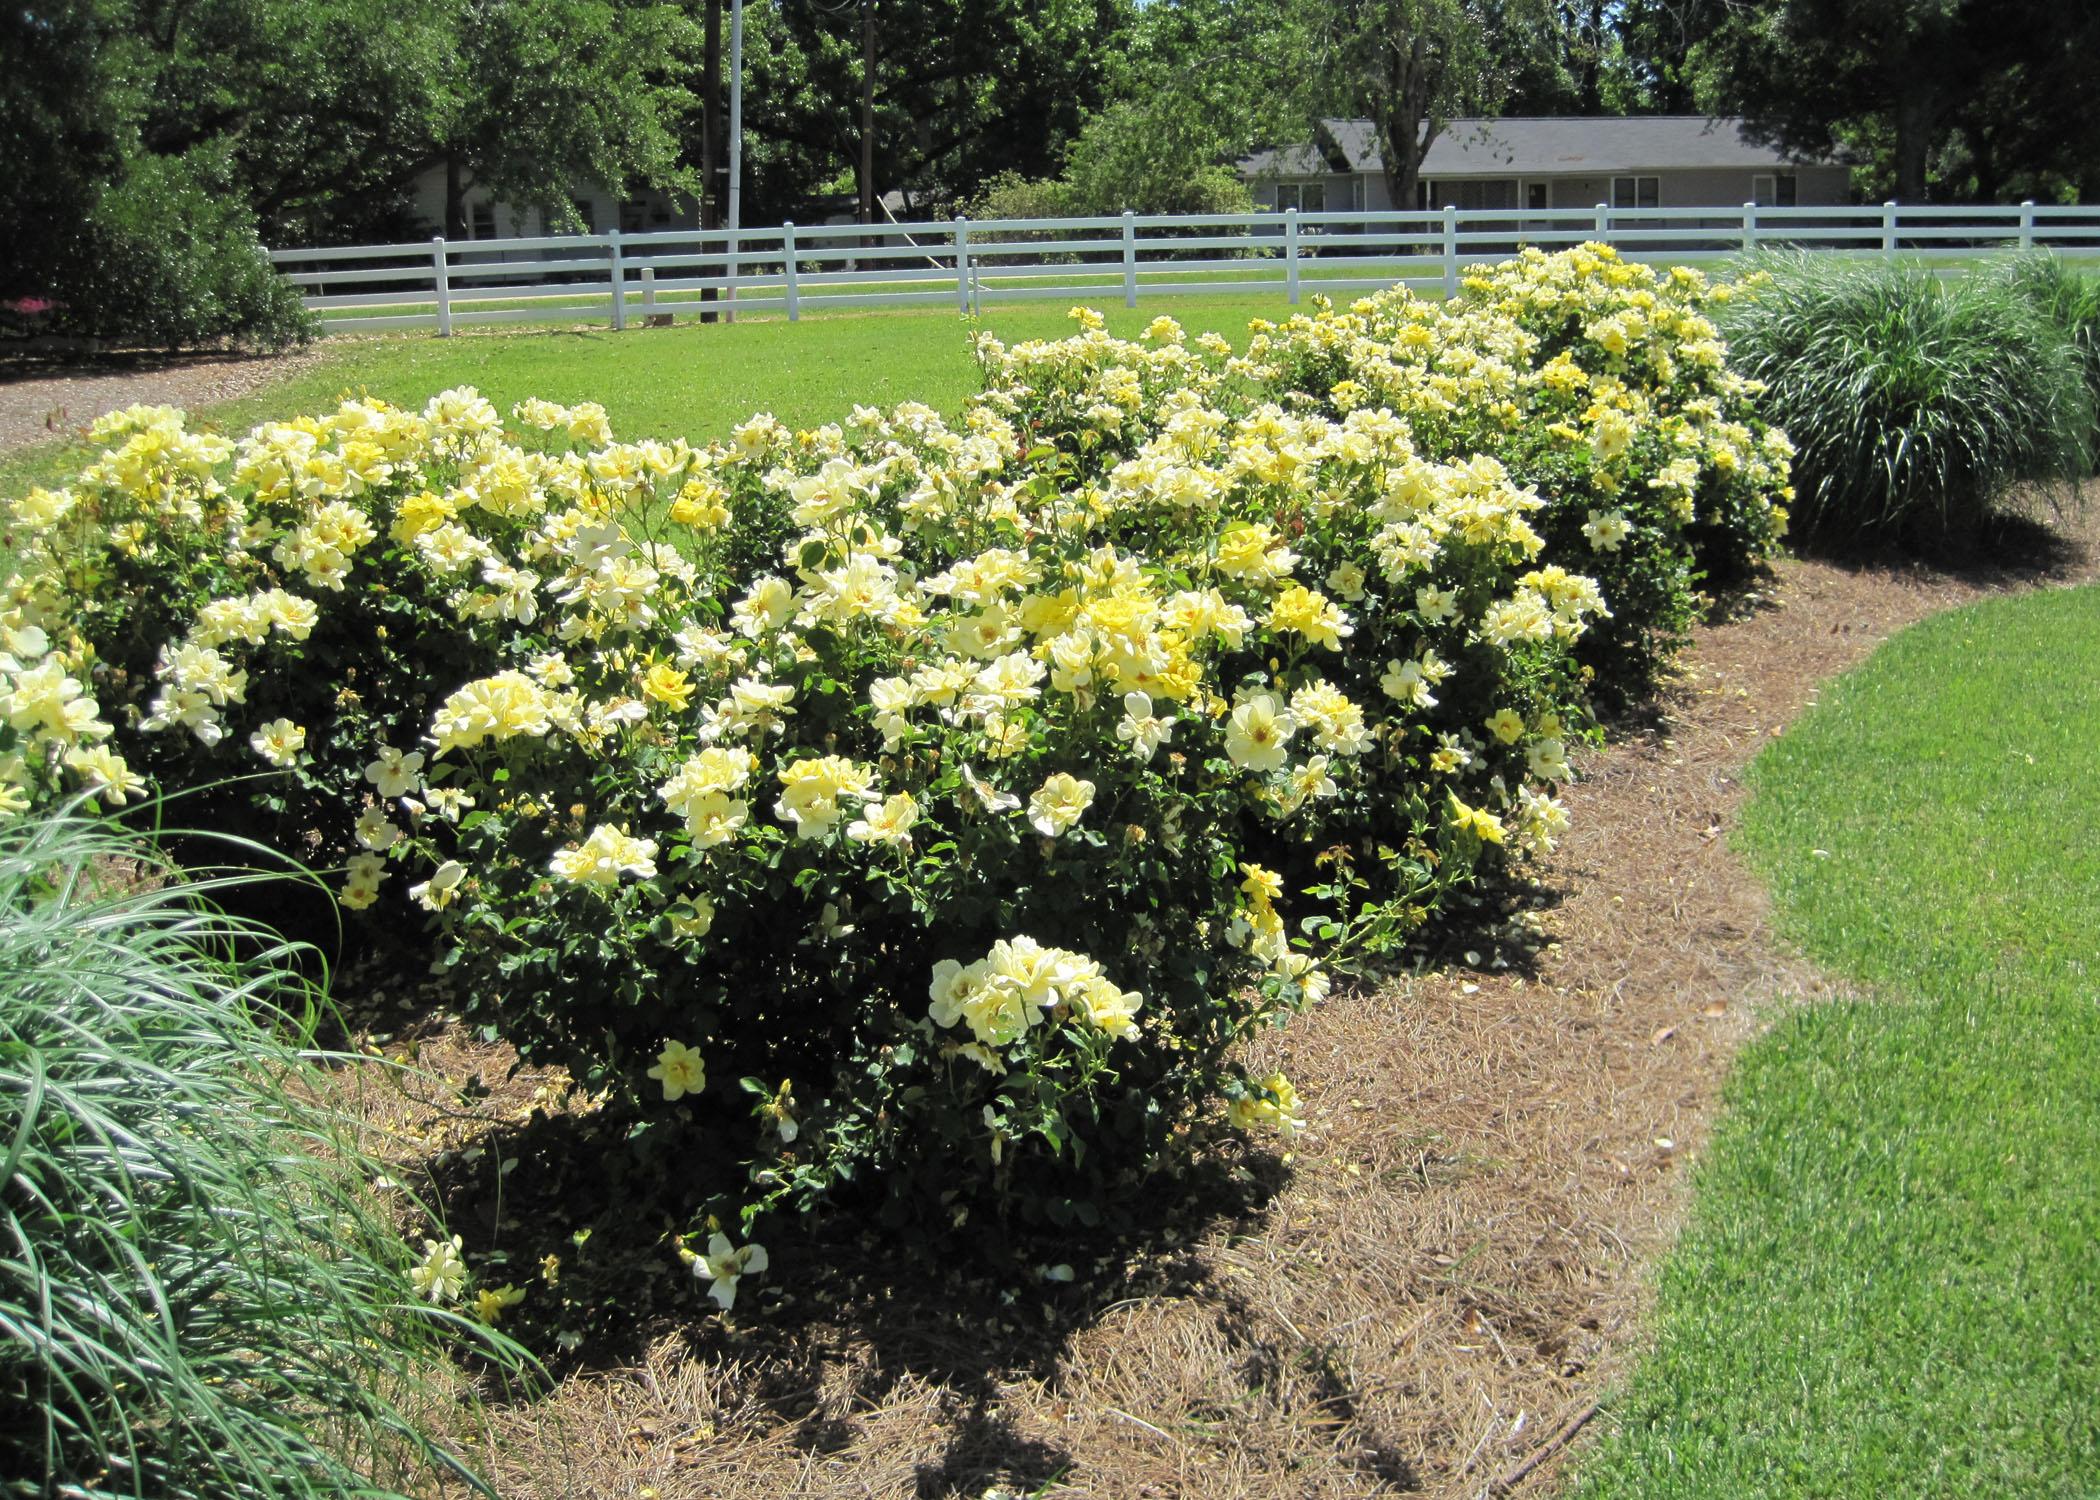 Prepare properly prior to planting